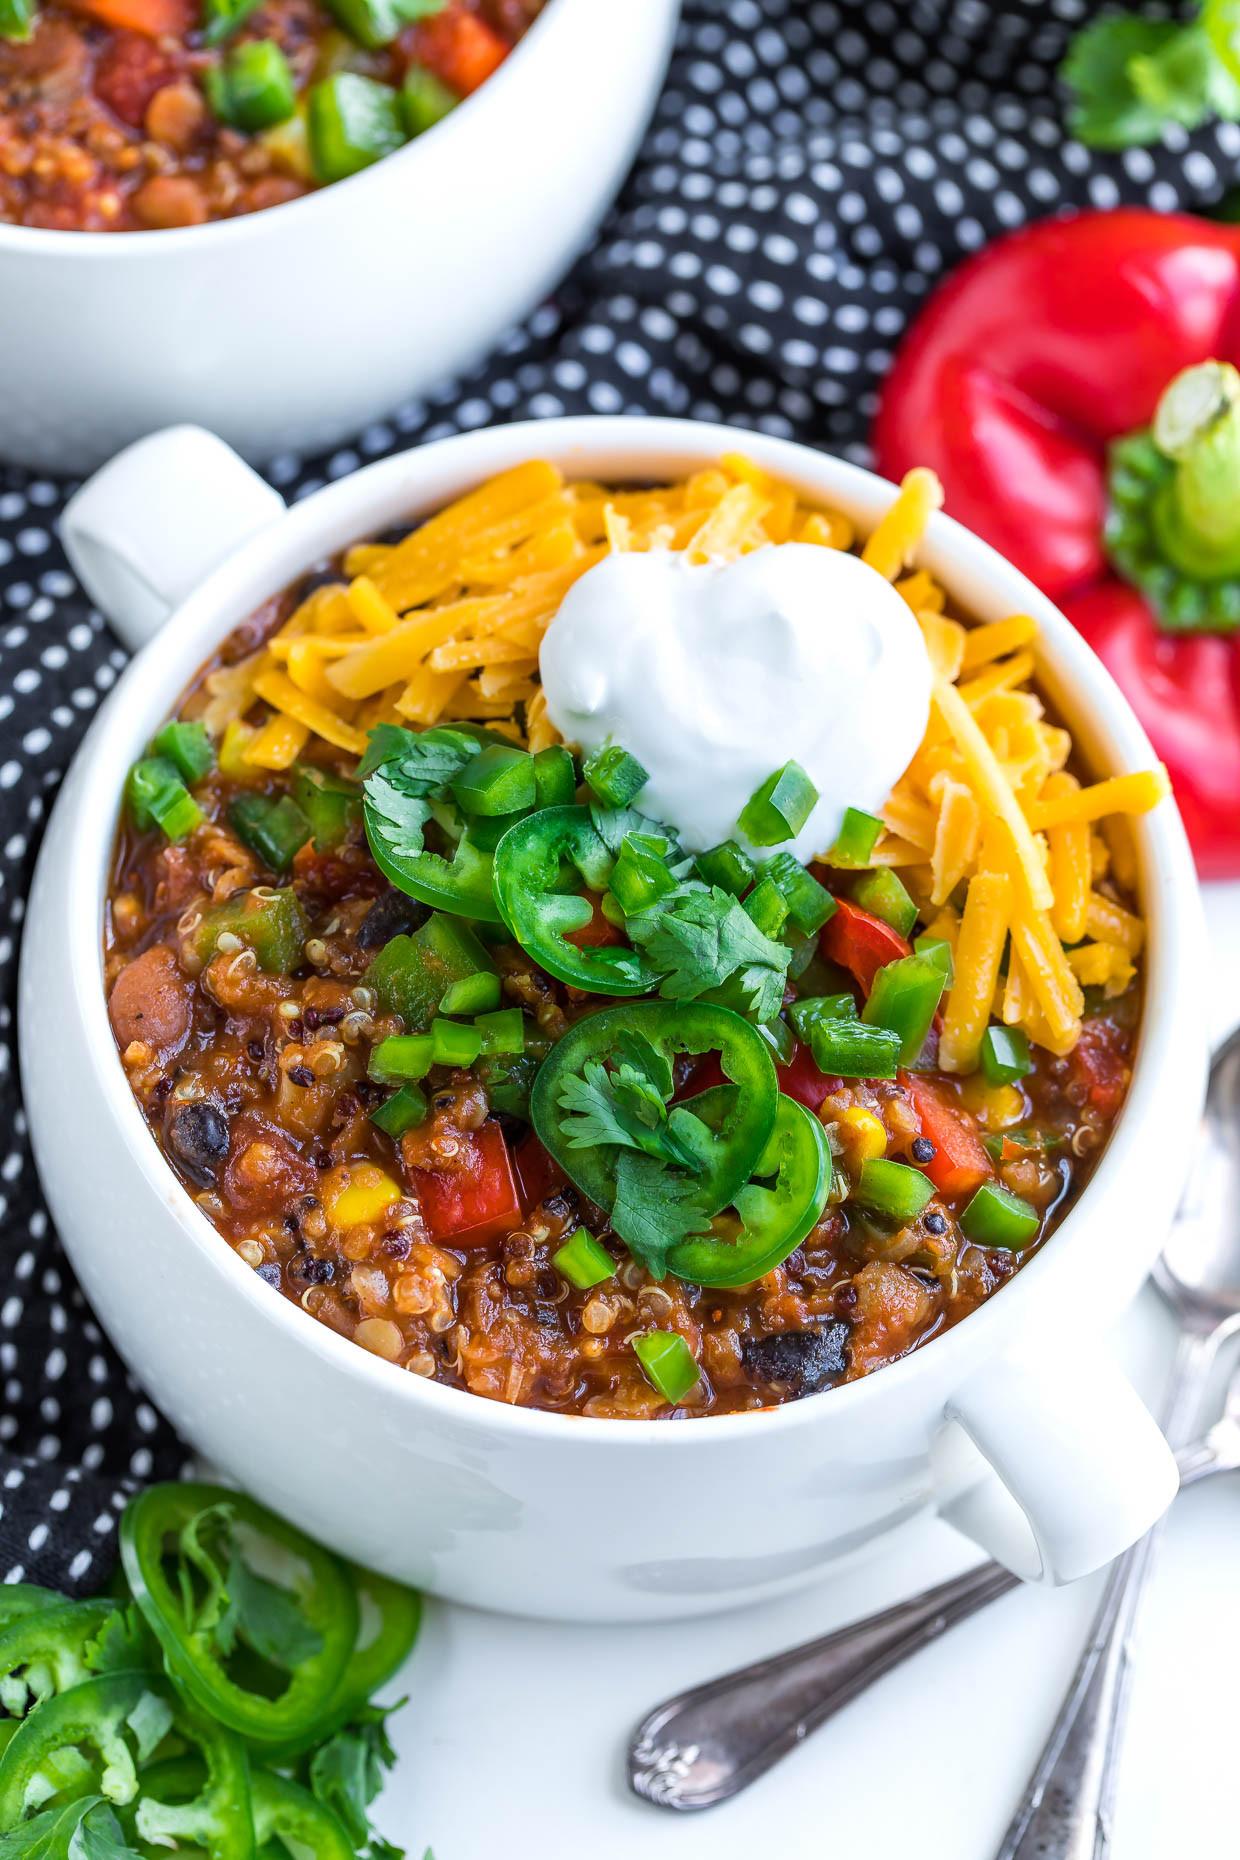 Easy Instant Pot Recipes Vegetarian  Instant Pot Ve arian Quinoa Chili Peas And Crayons